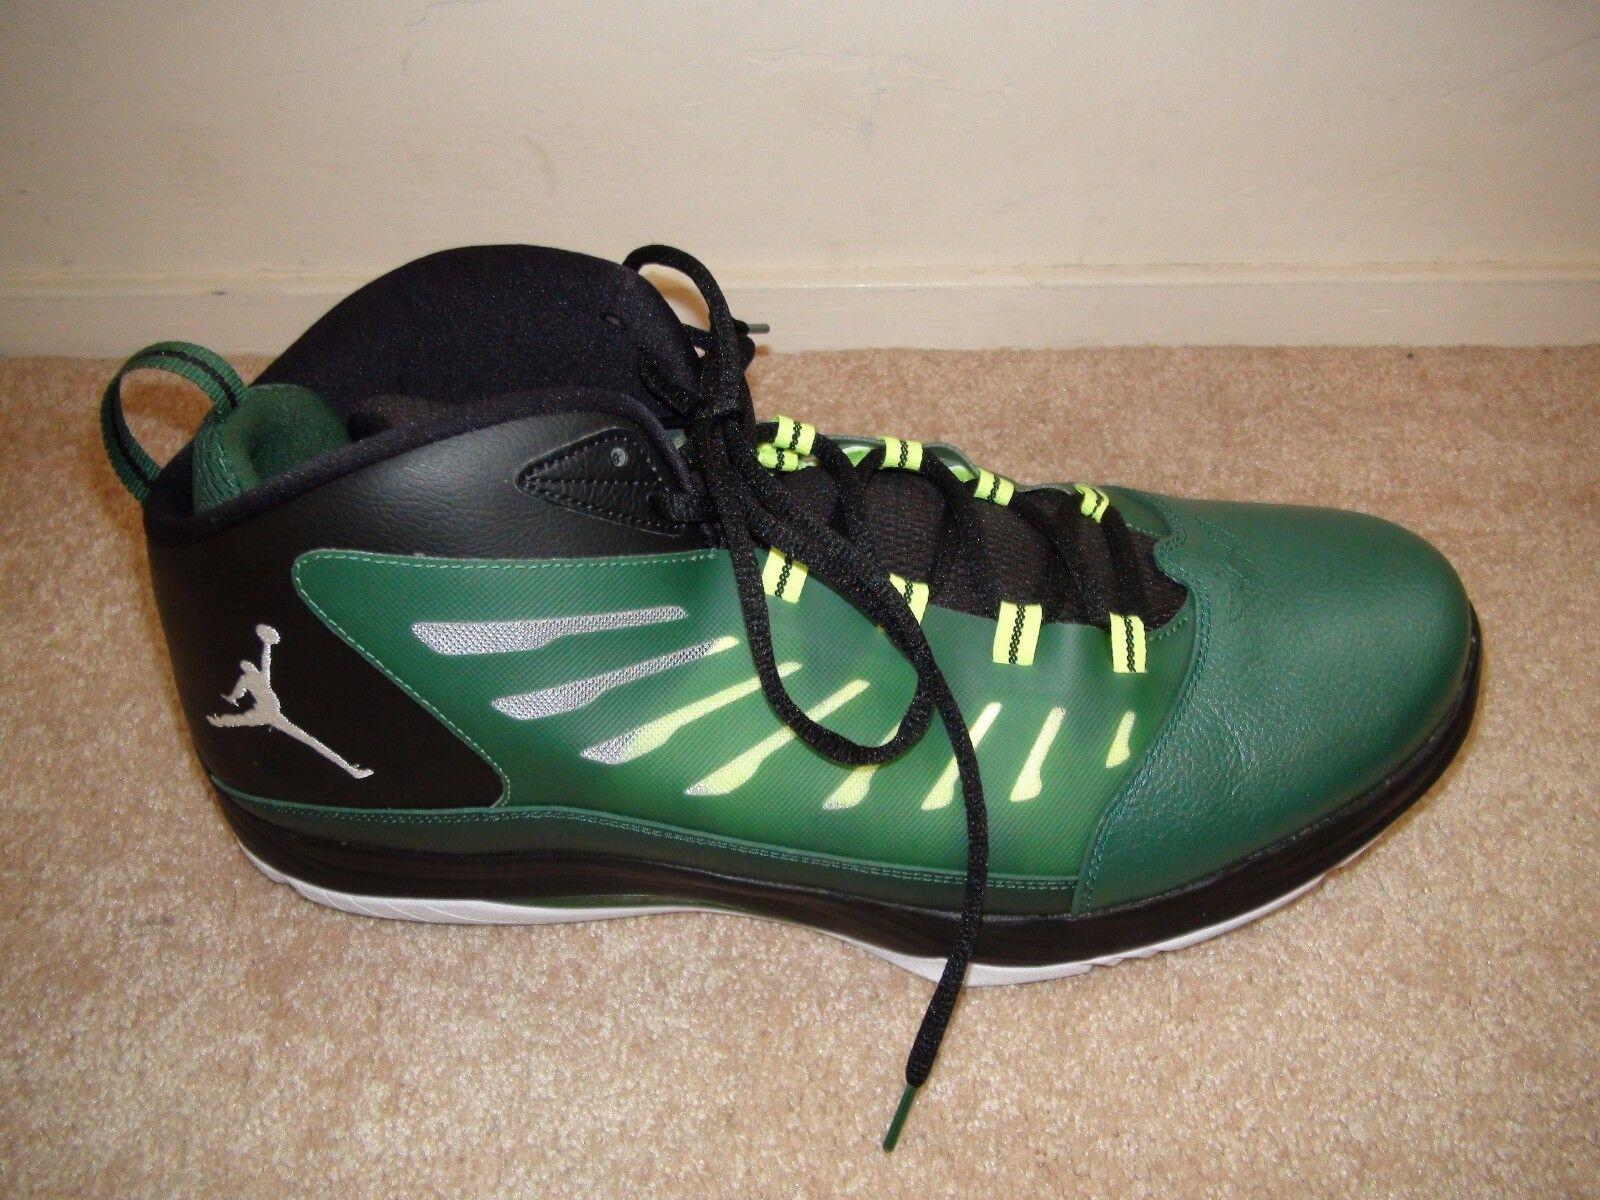 Nike 654287 301 michael jordan il primo volo tech uomini scarpe da basket verde sz 18